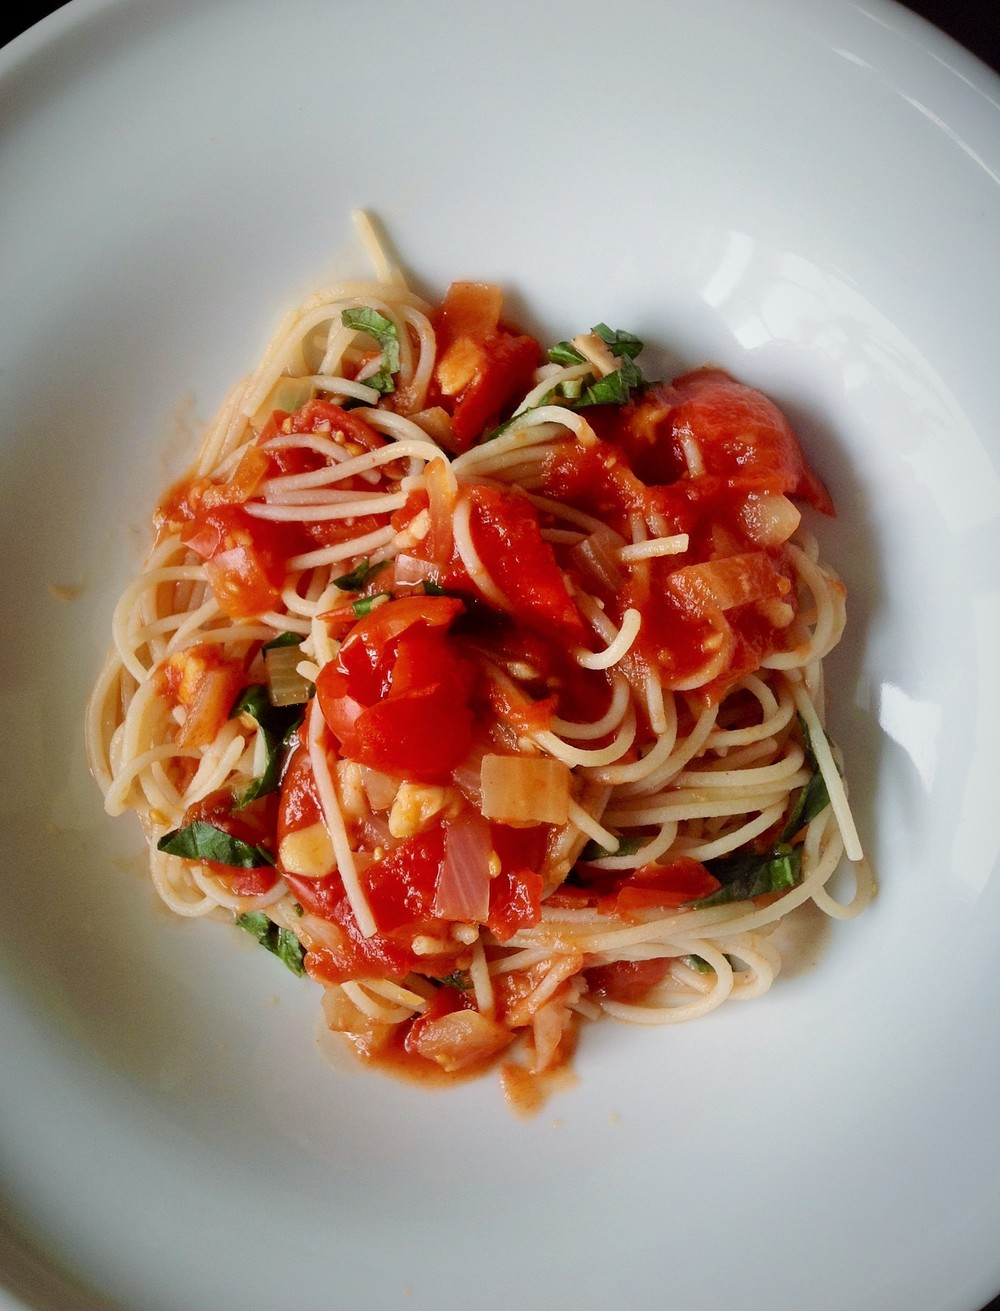 Brown Rice Pasta with Garlic Tomato Sauce